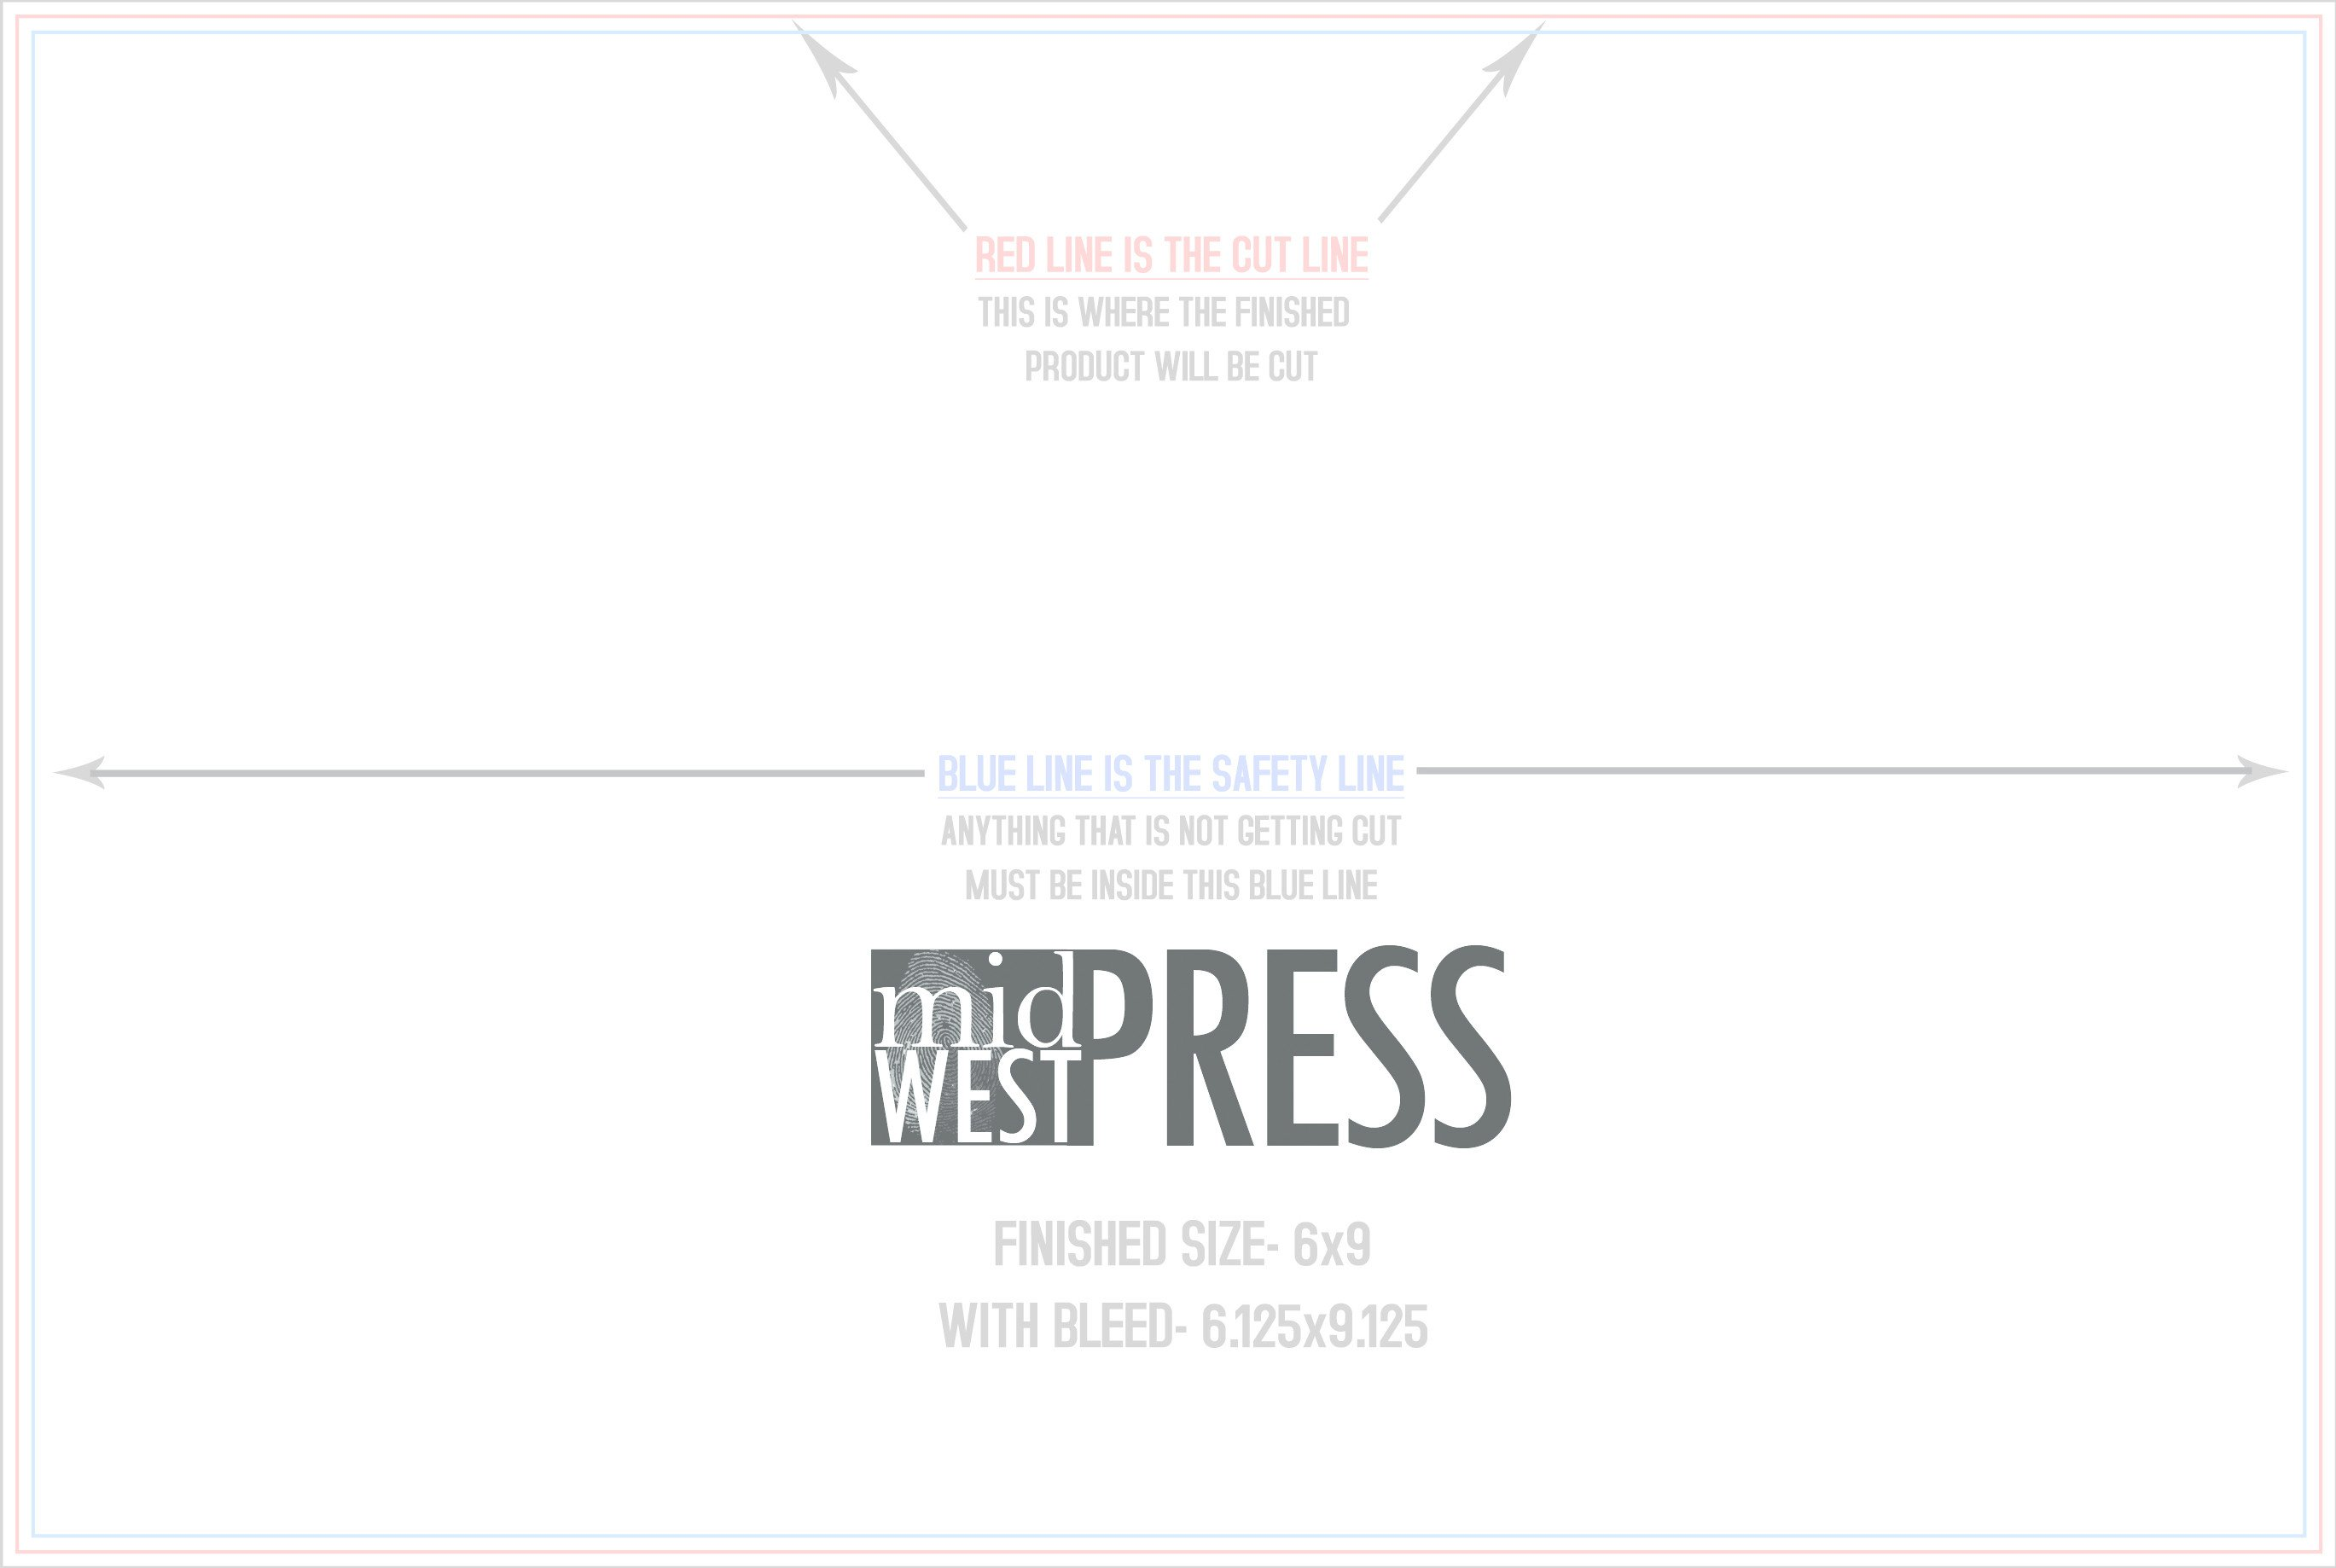 6 X 9 Postcard Template 6 X 9″ Postcard Template – Midwest Press